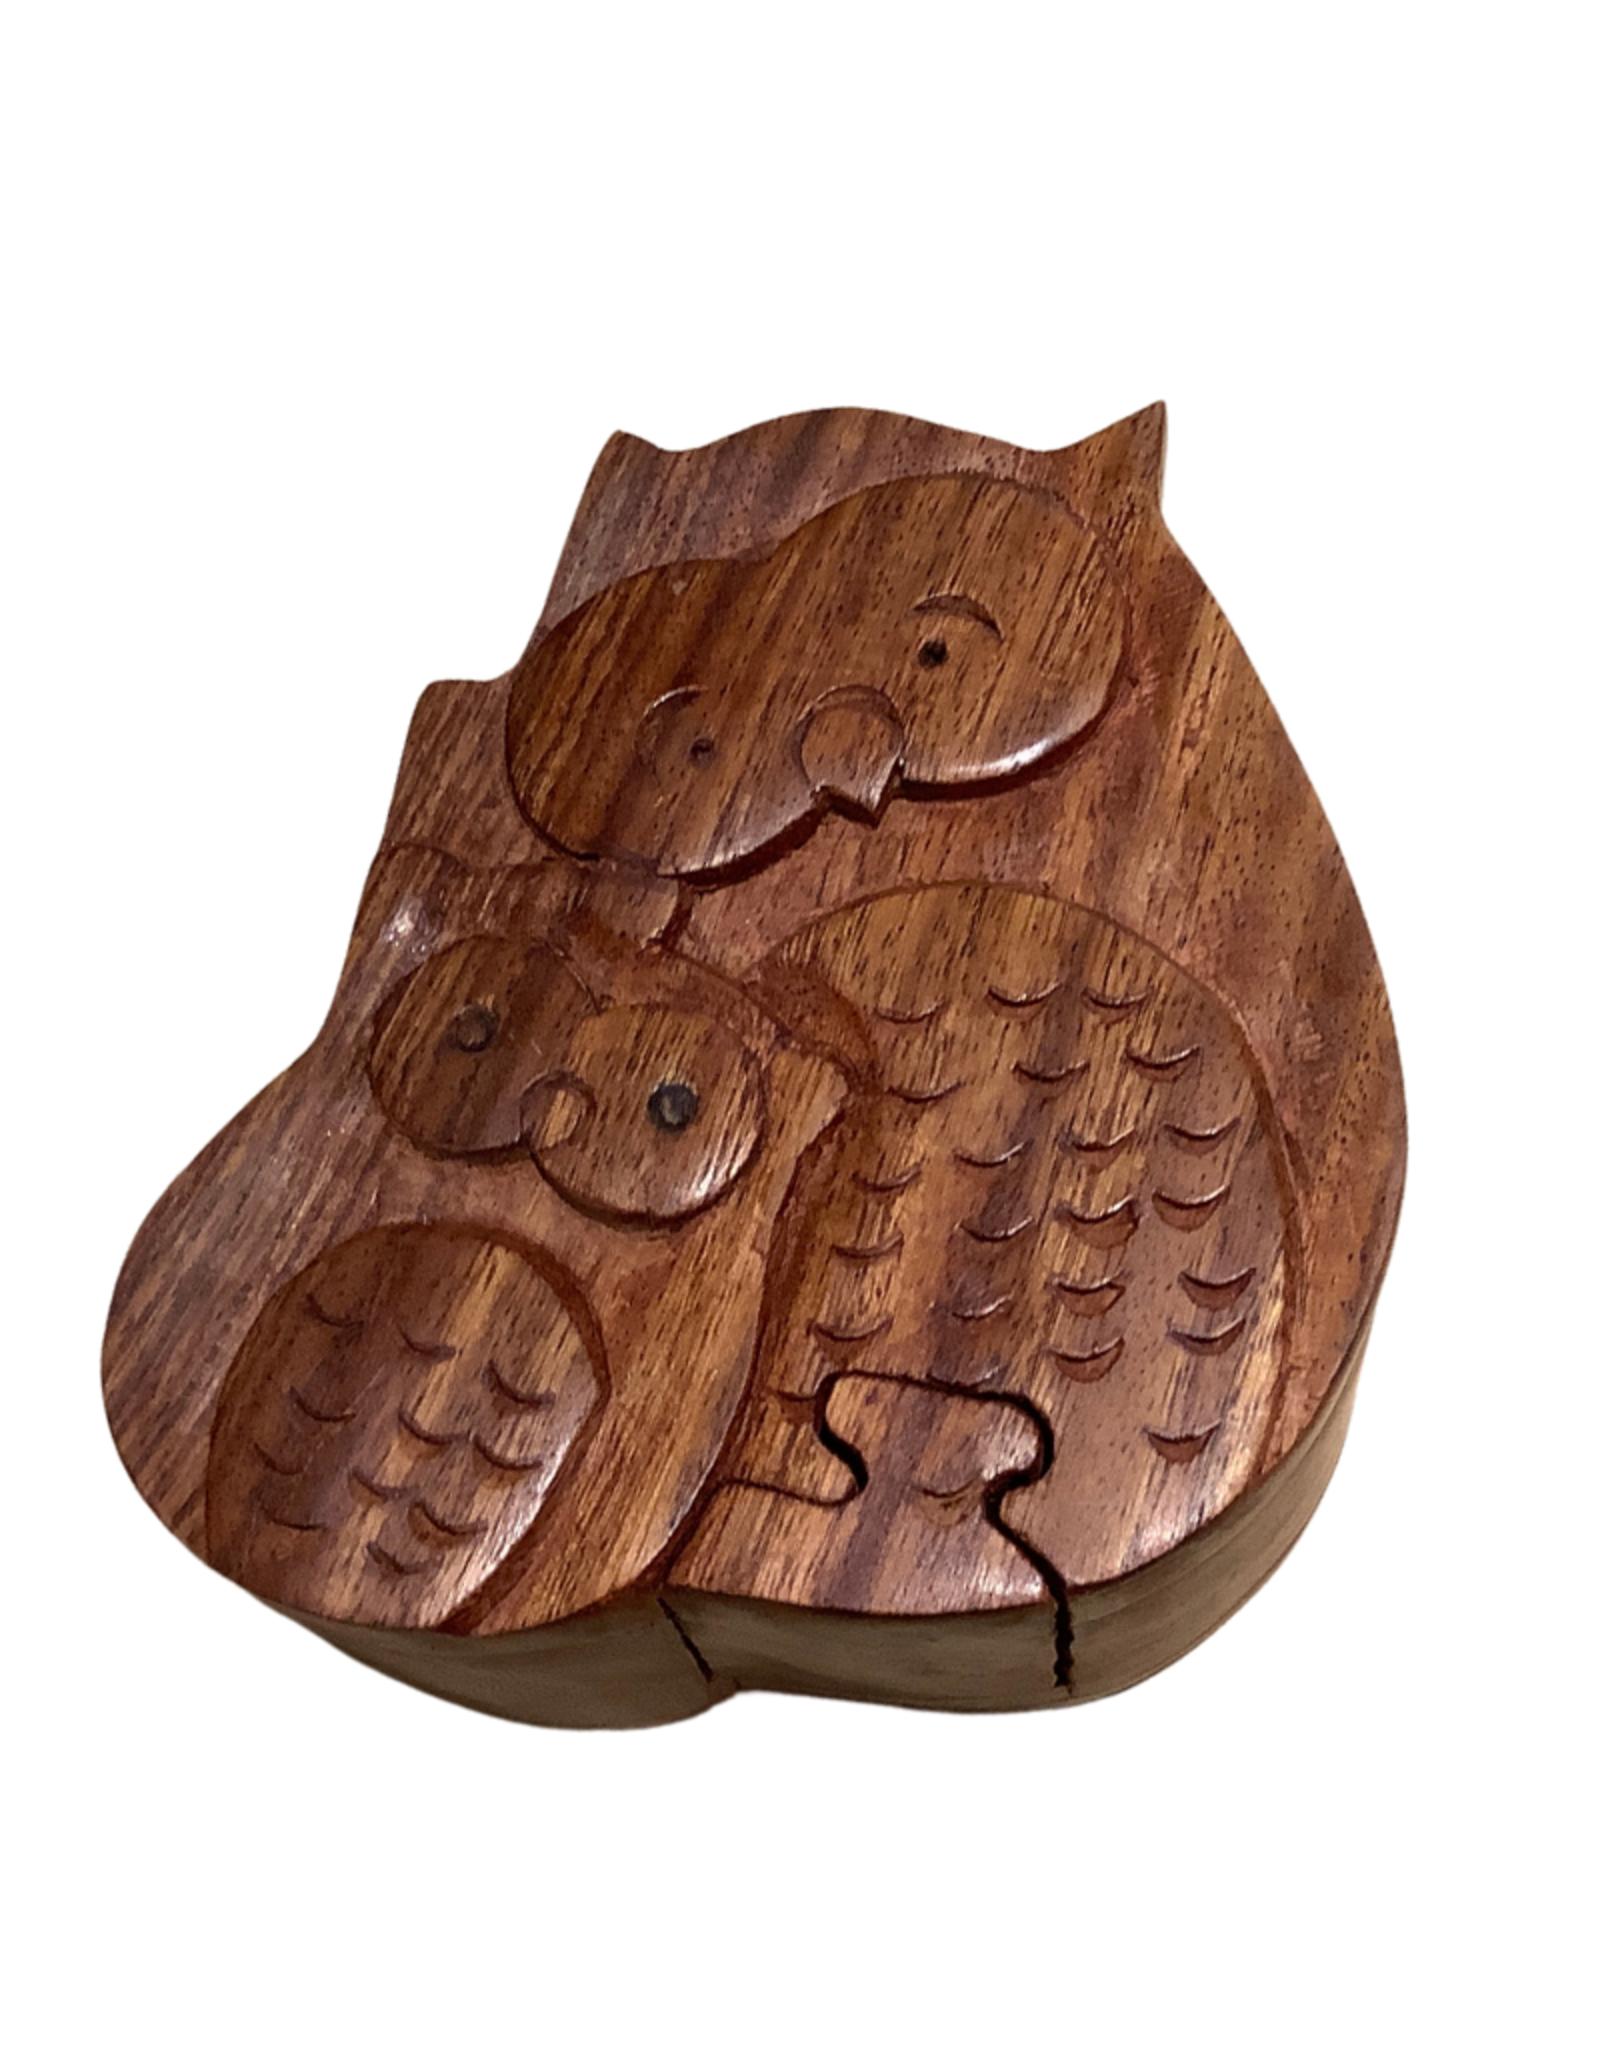 Cuddling Owls Puzzle Box